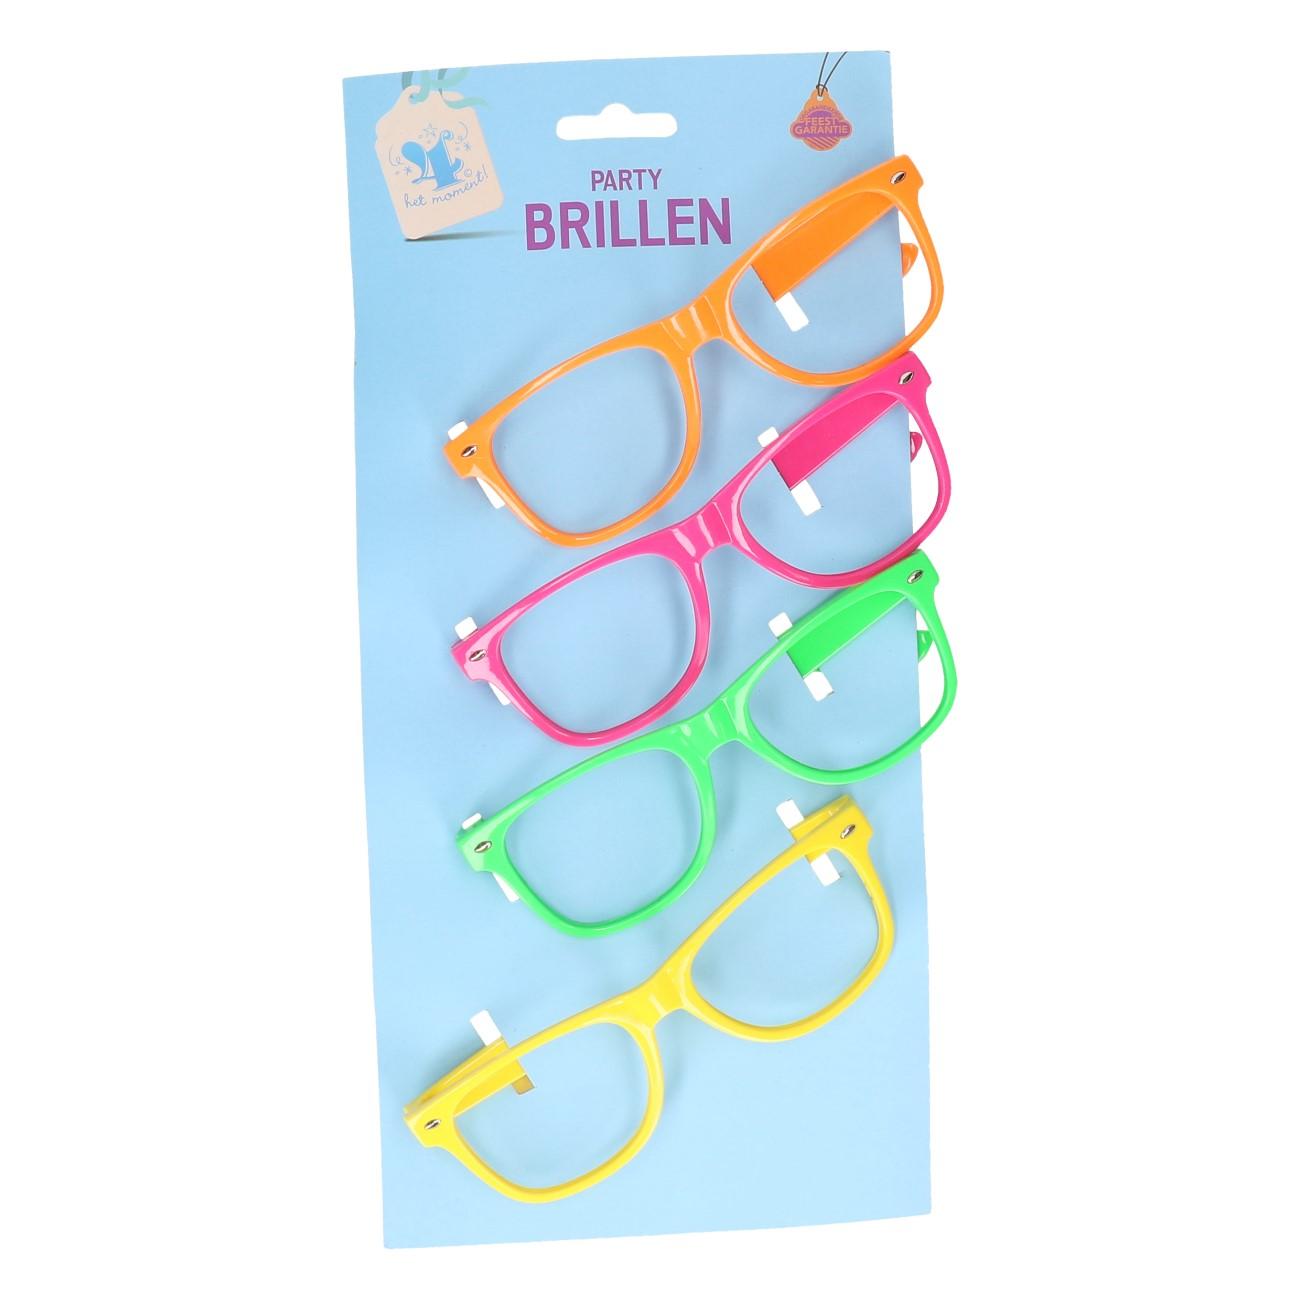 Partybrillen neon 4 stuks